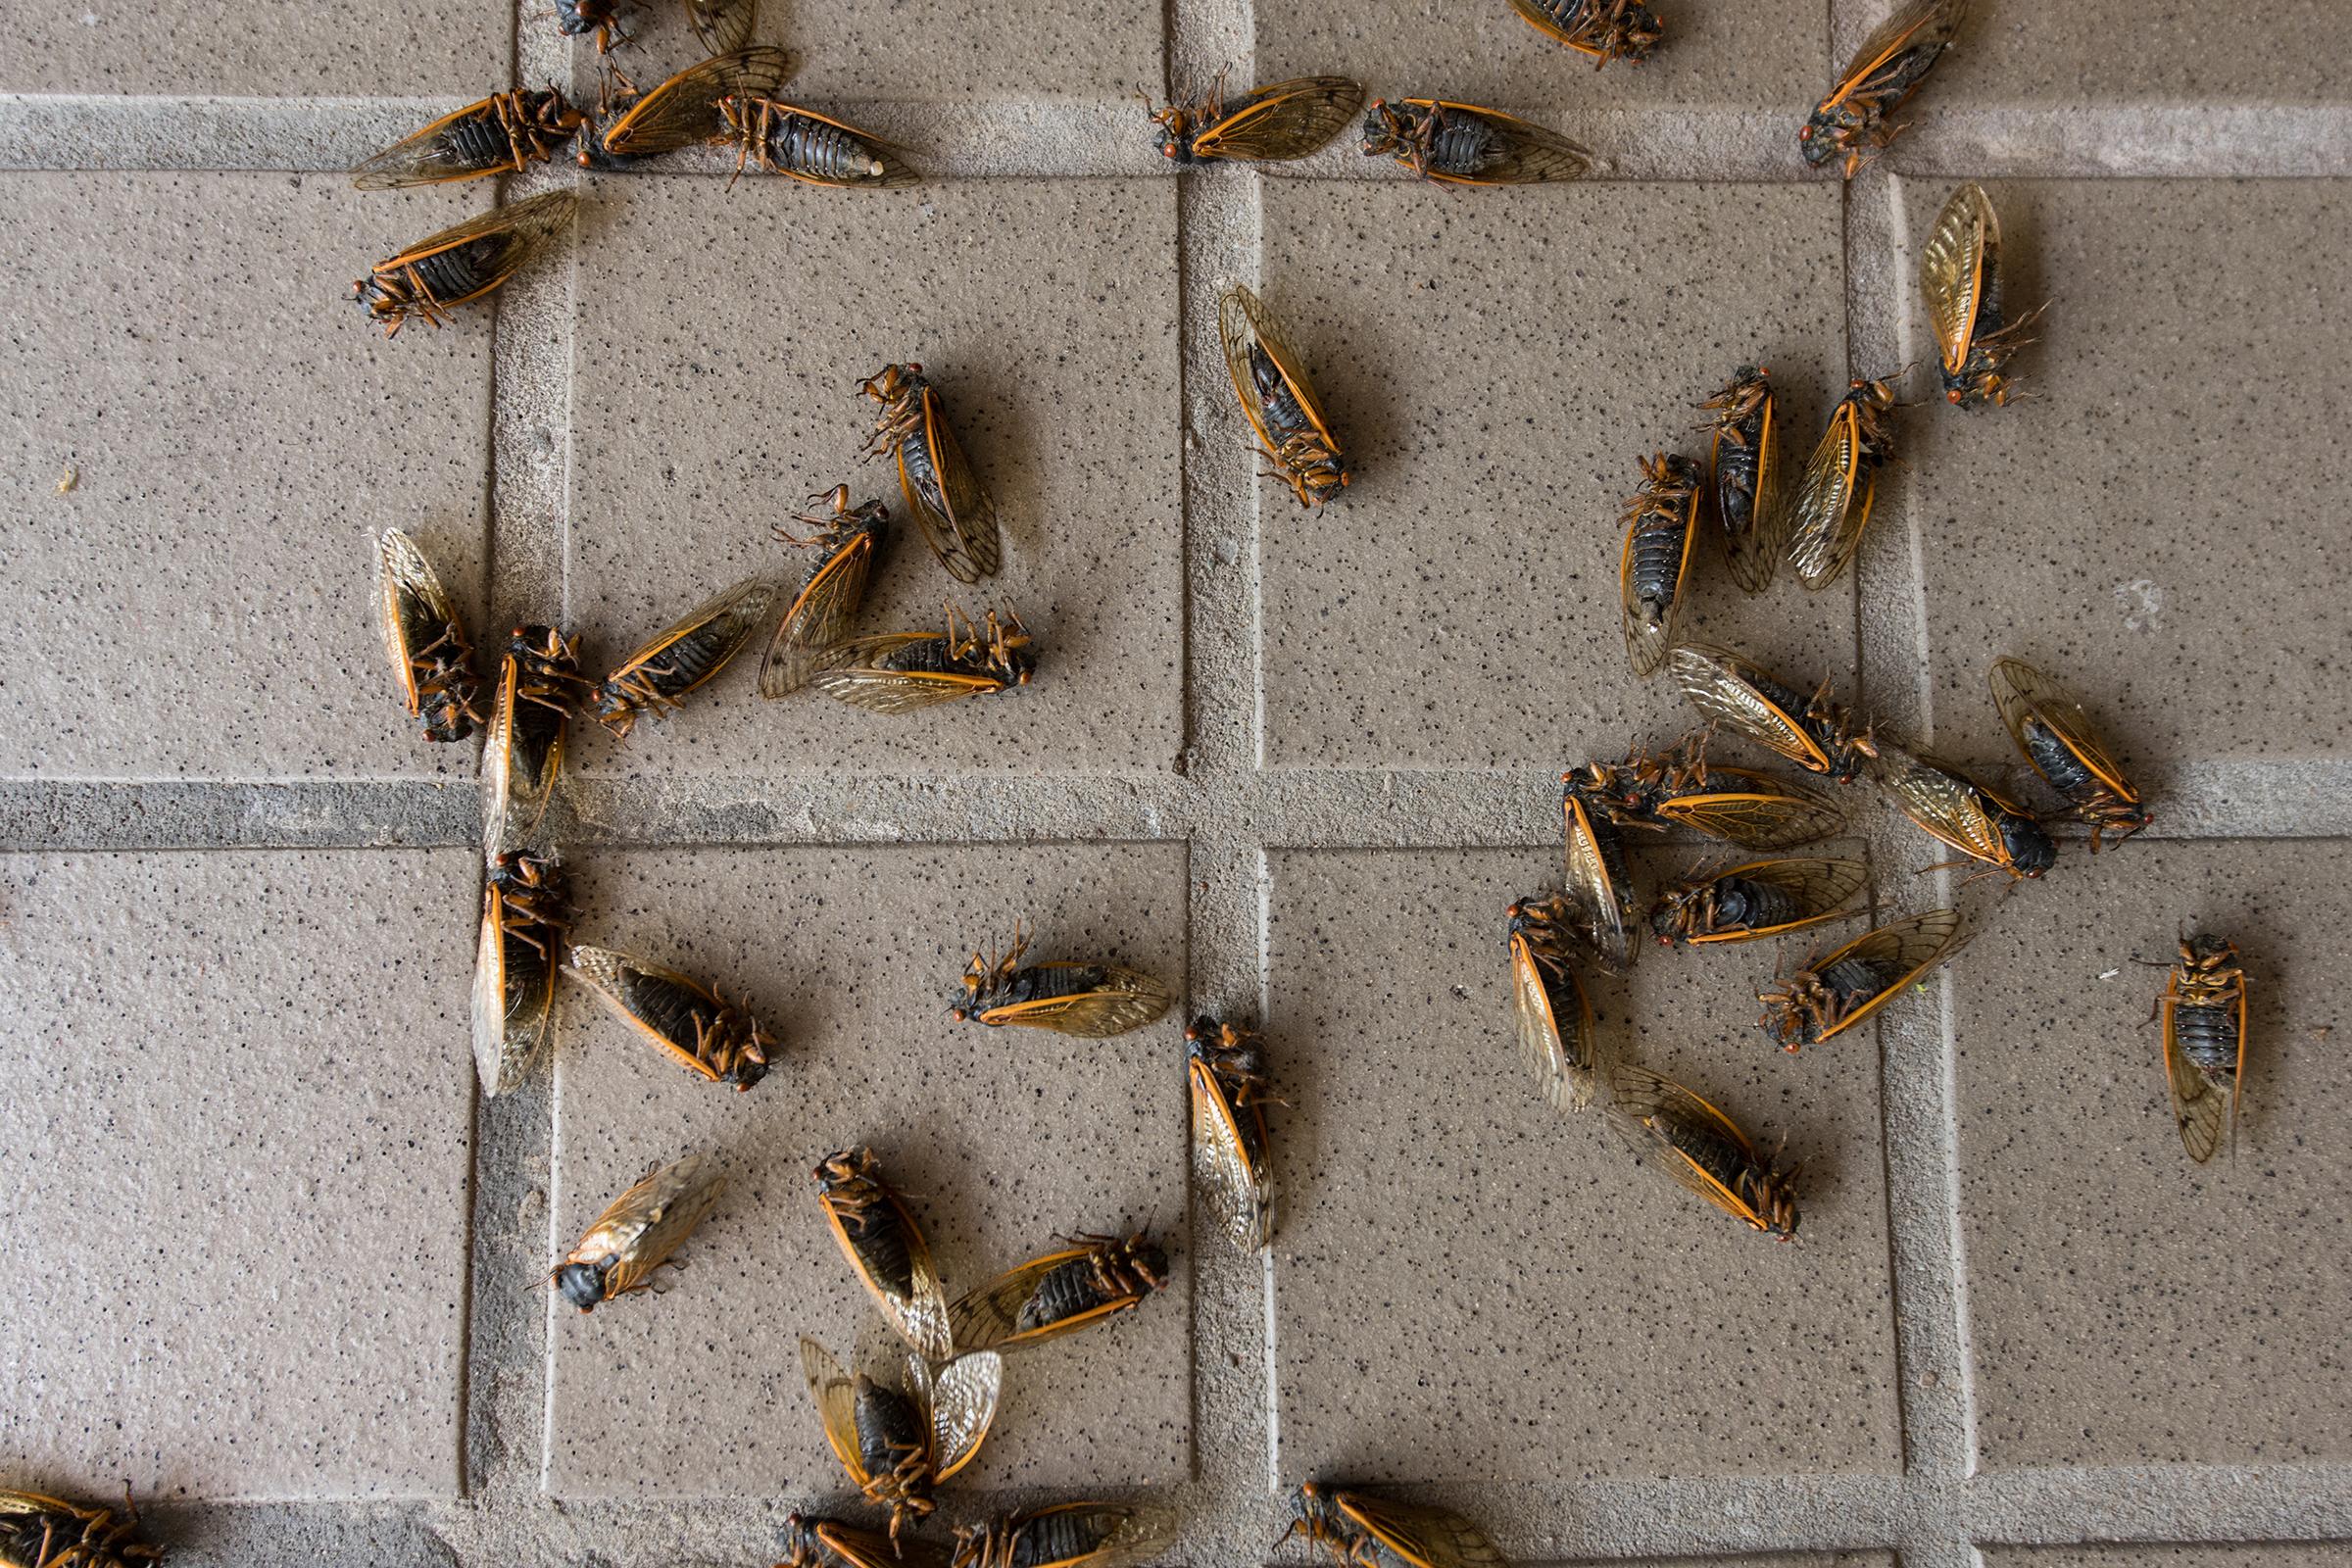 Dead cicadas lay outside a shop in downtown Cincinnati on June 13, 2021.